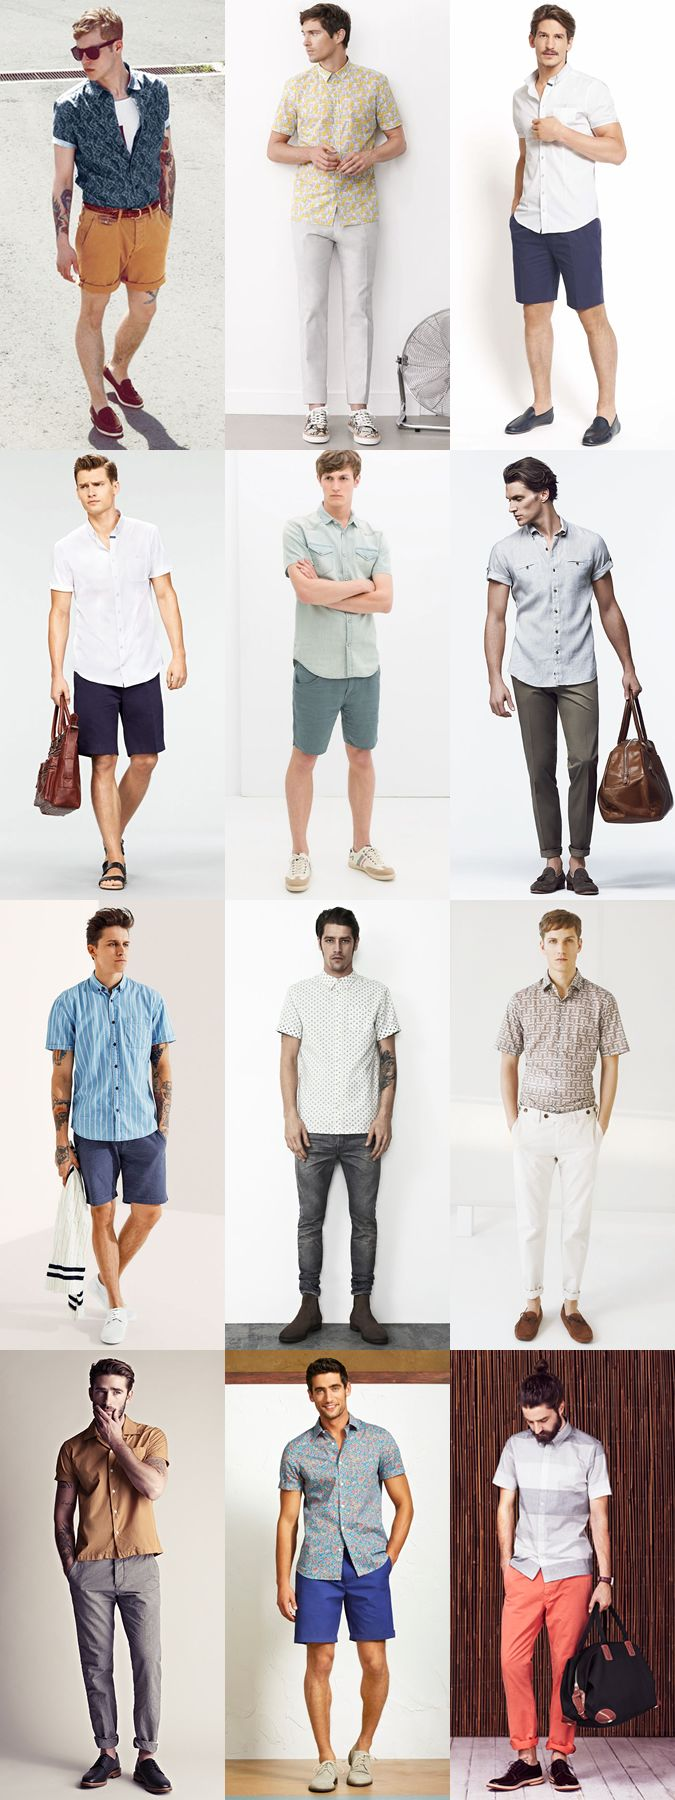 Men's Short Sleeve Shirts Summer Outfit Inspiration Lookbook